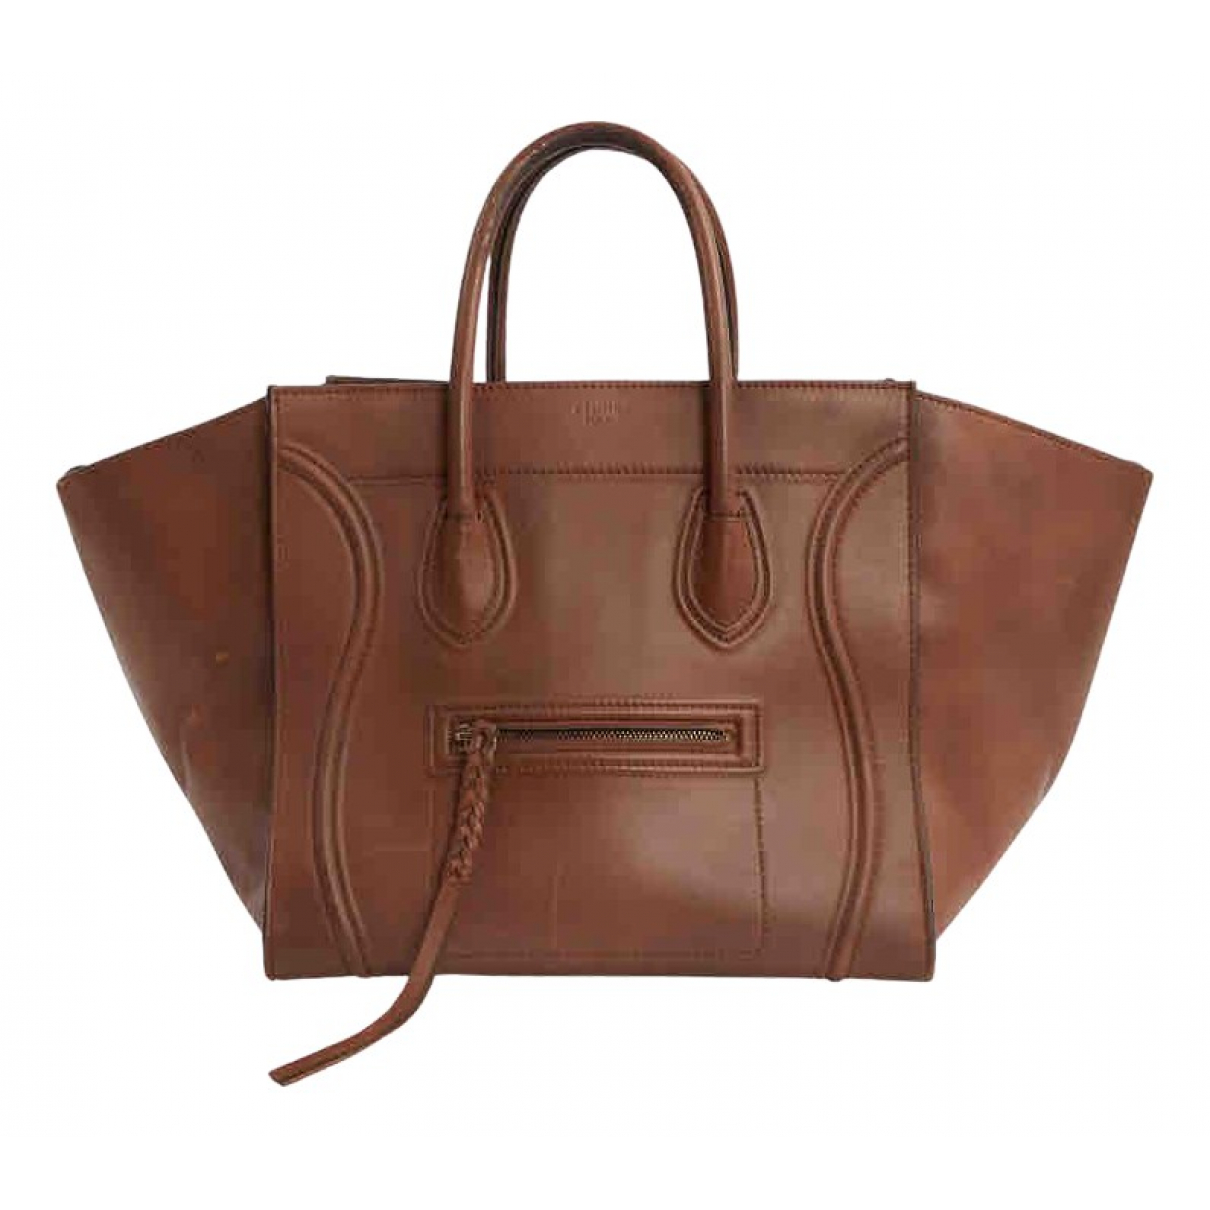 Celine Luggage Phantom Handtasche in  Braun Leder